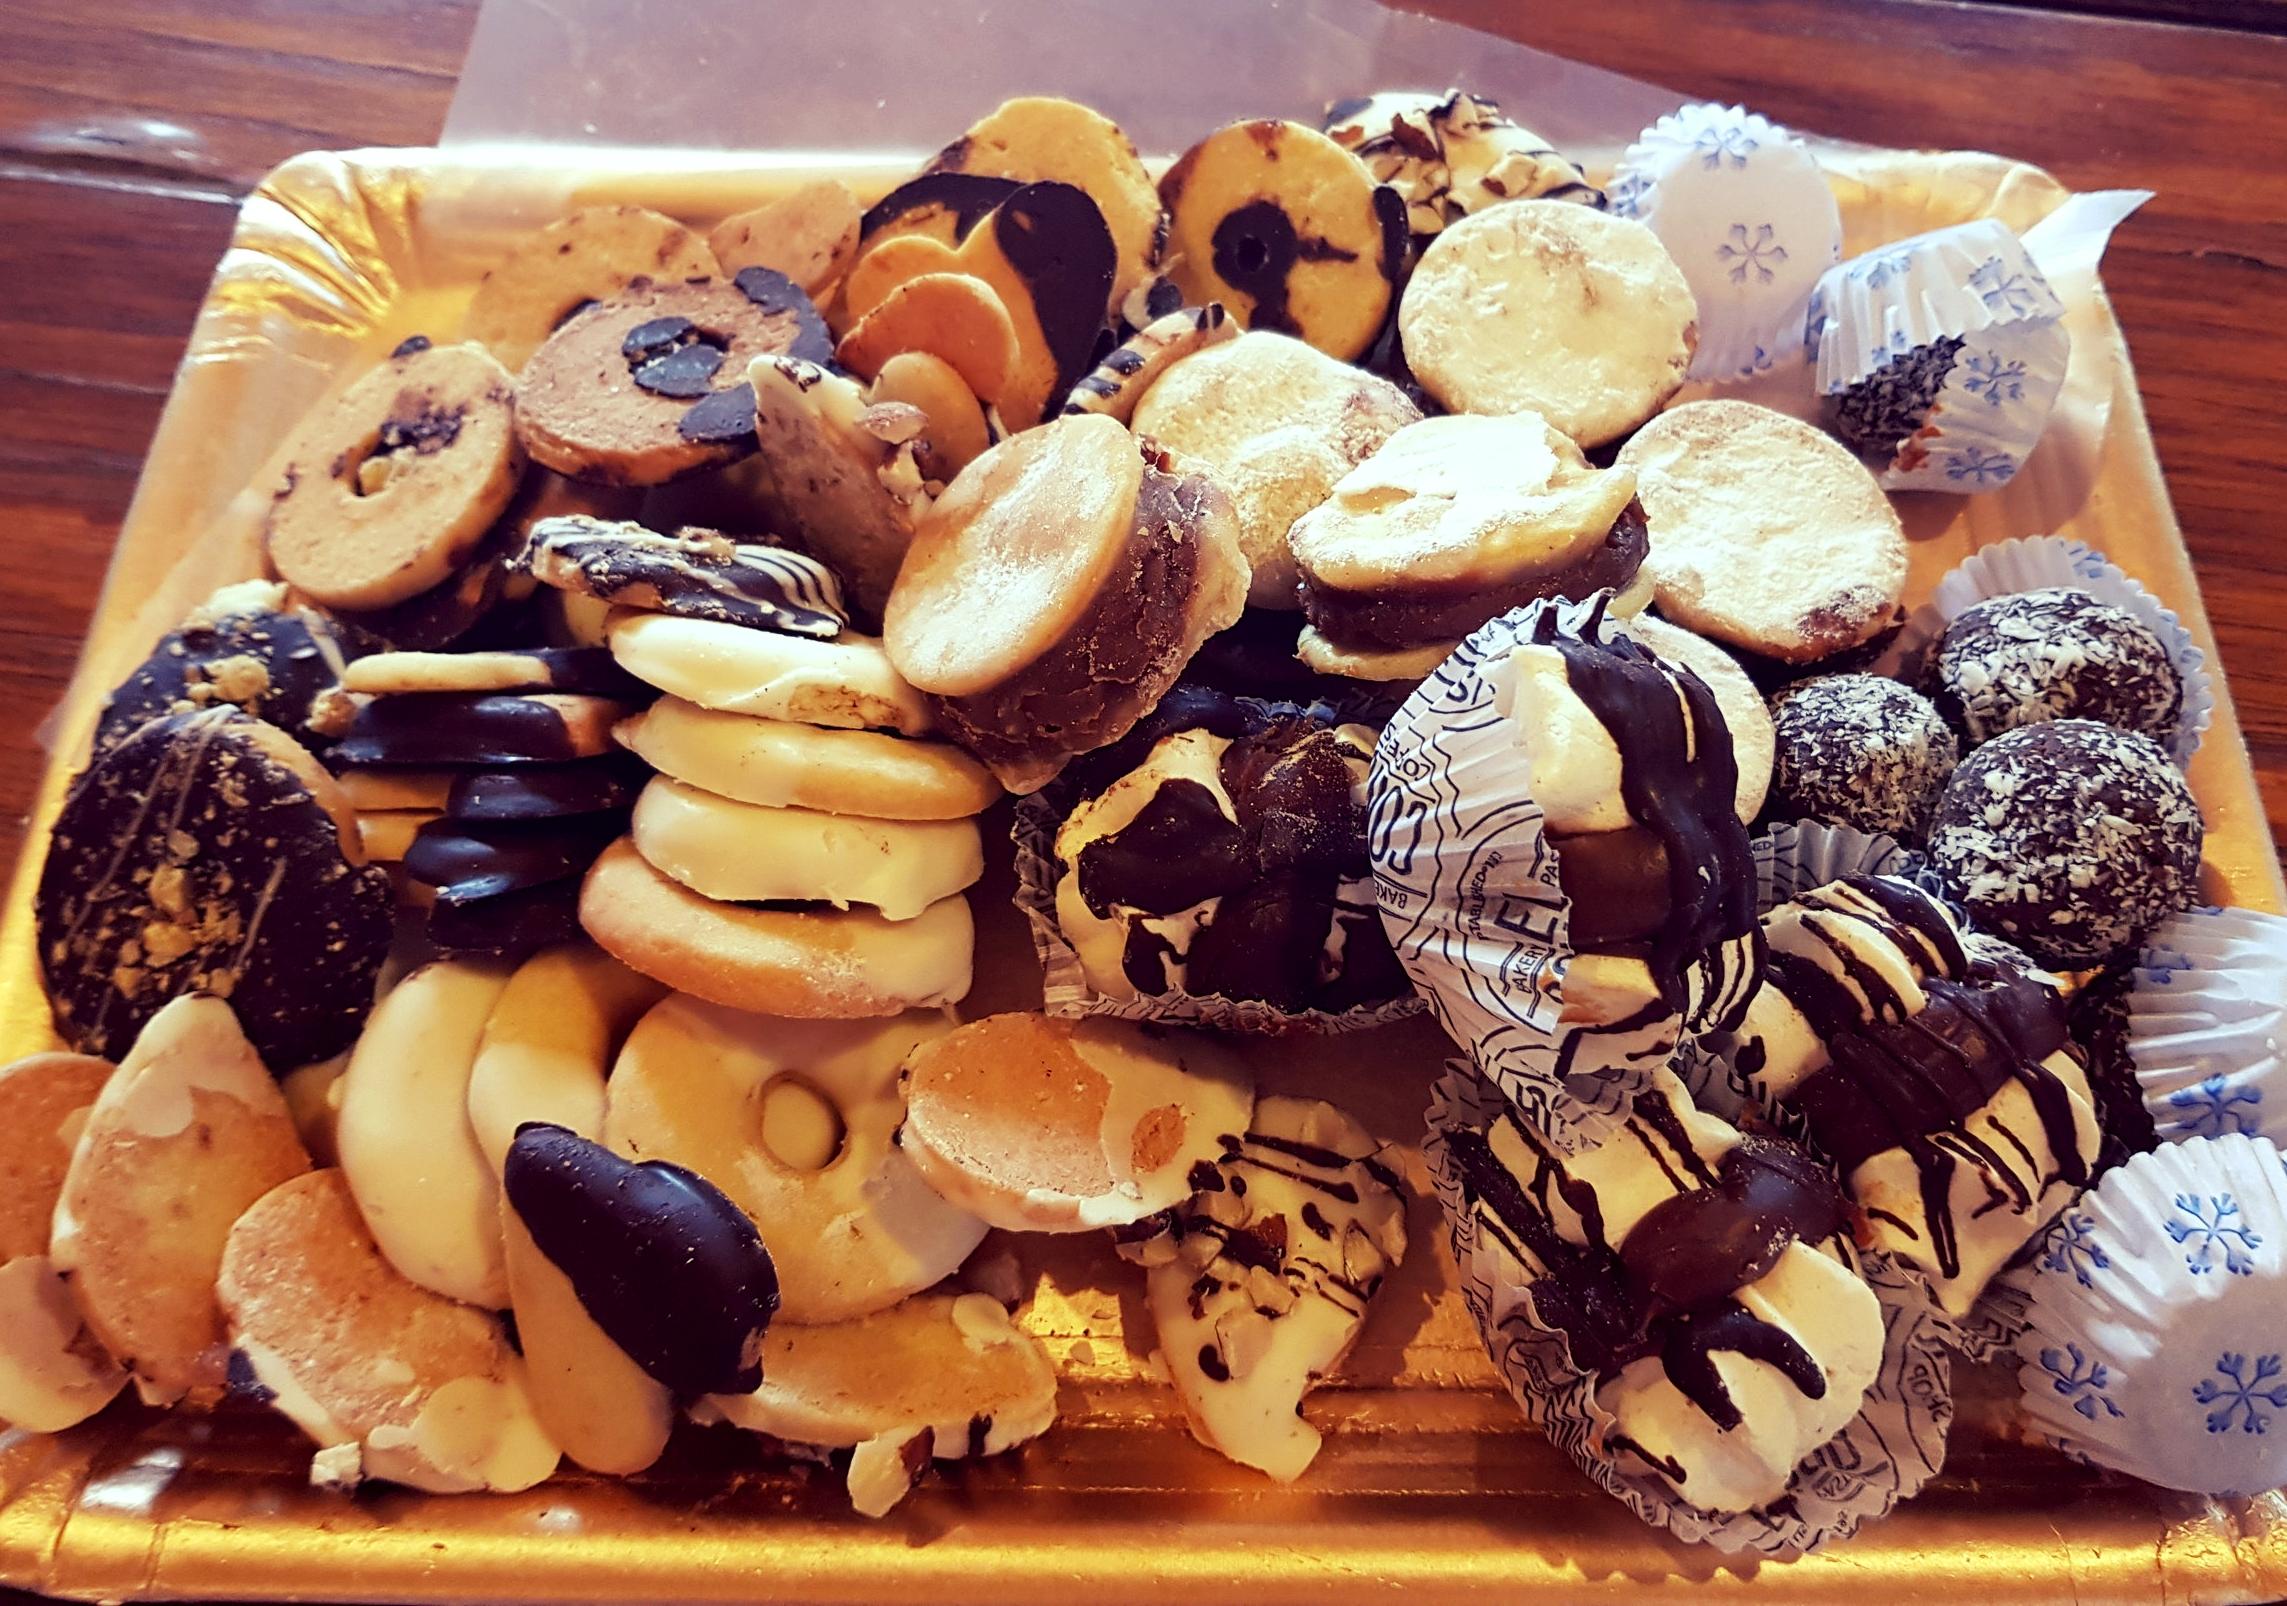 A pile of beautiful sweet treats!